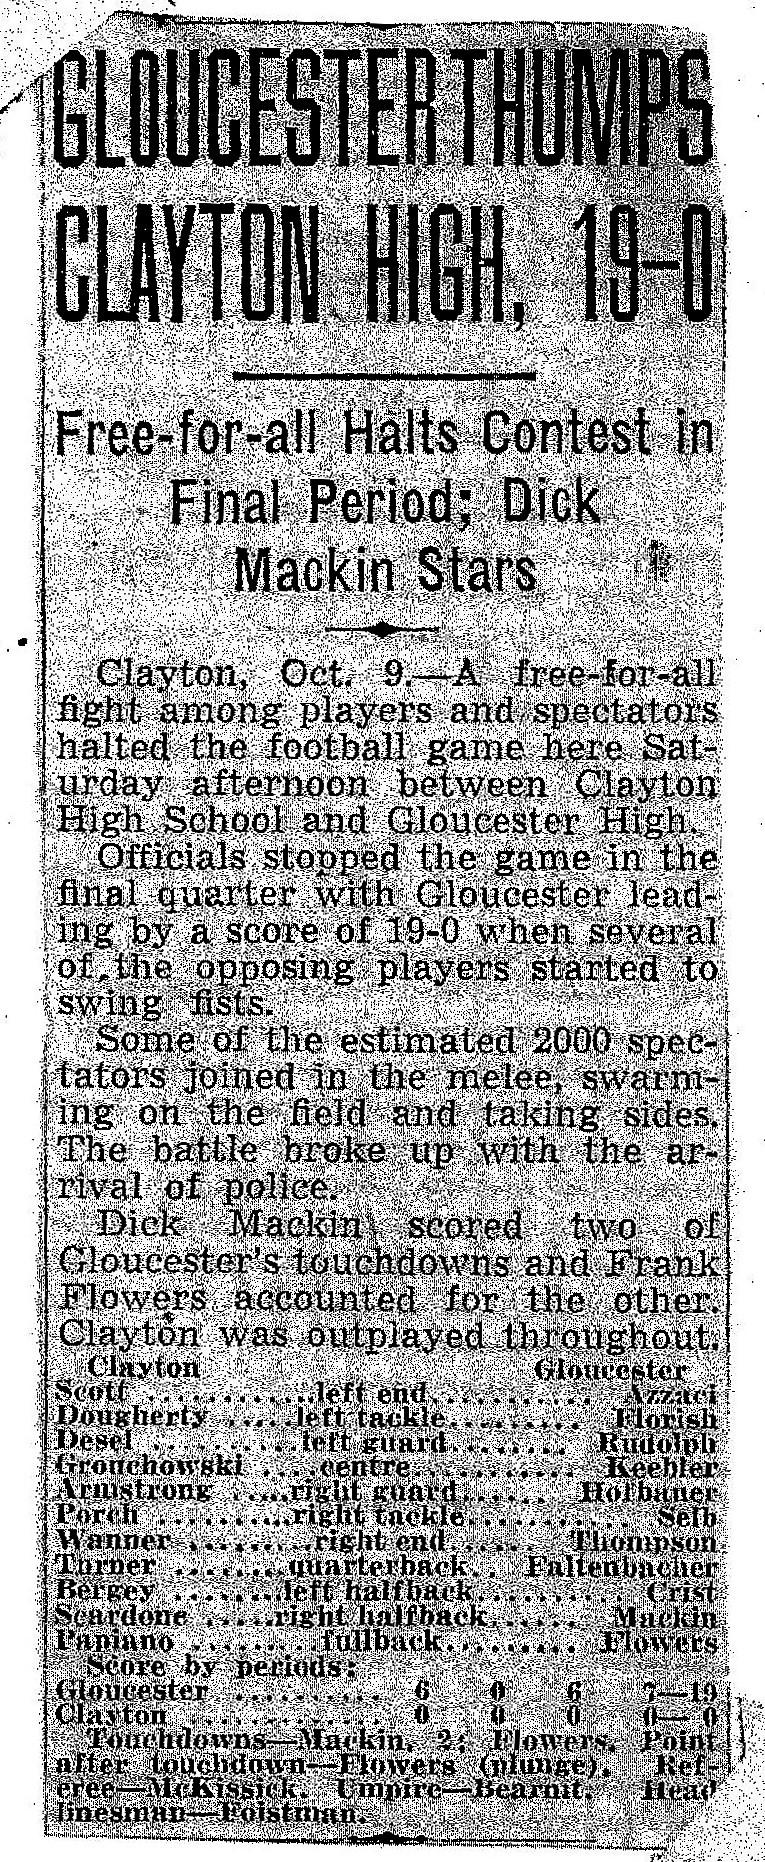 Gloucester HS -Clayton Football Game 001 (2)